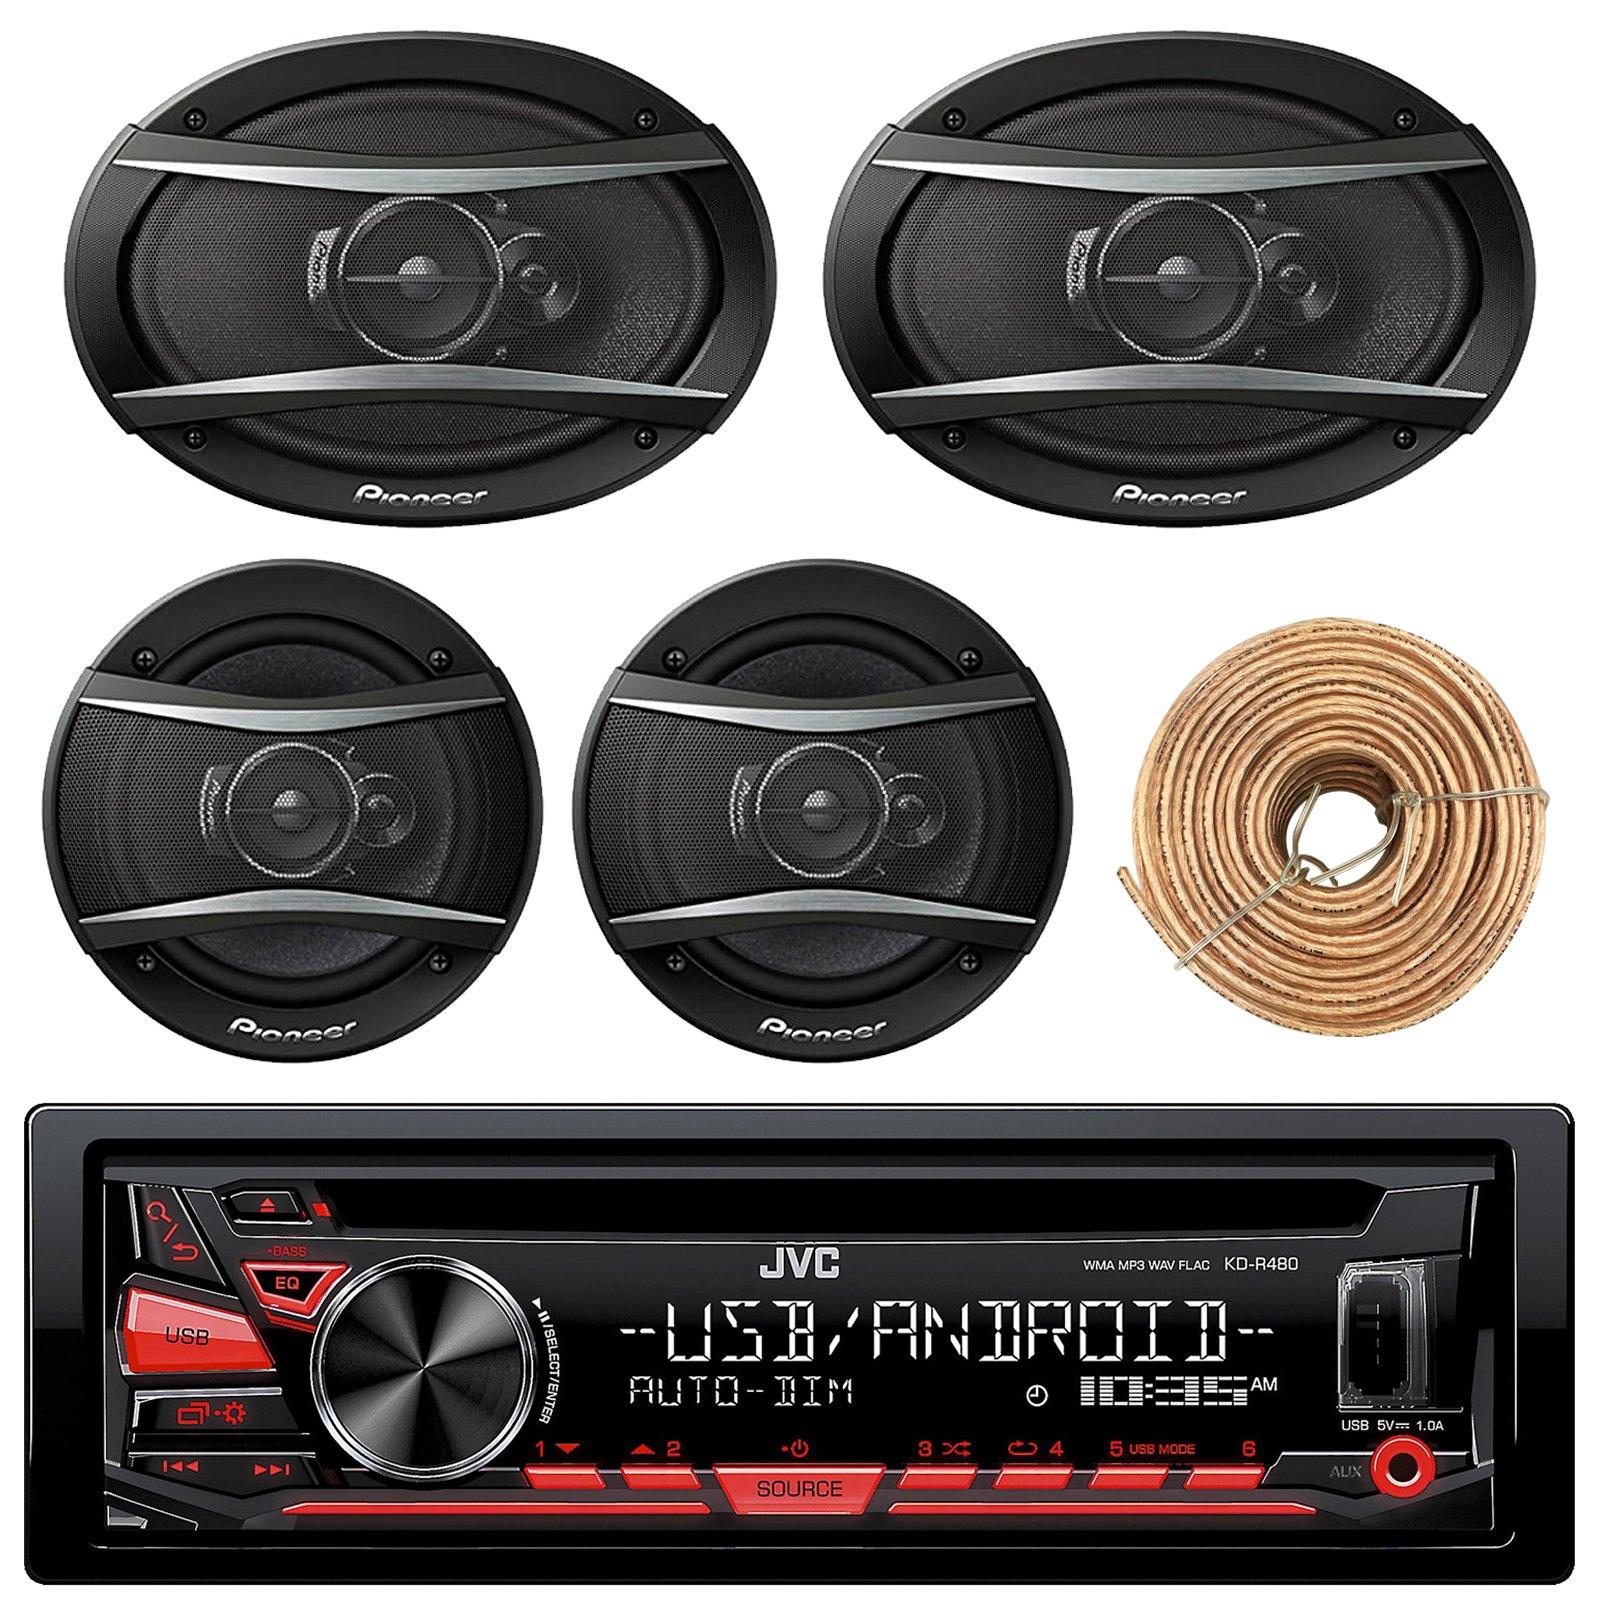 JVC KDR480 Car Radio USB AUX CD Player Receiver - Bundle With 2x TSA1676R 6.5'' 3-Way Car Audio Speakers - 2x 6.5''-6.75'' 4-Way Stereo Speaker + Enrock 50Ft 18 Gauge Speaker Wire